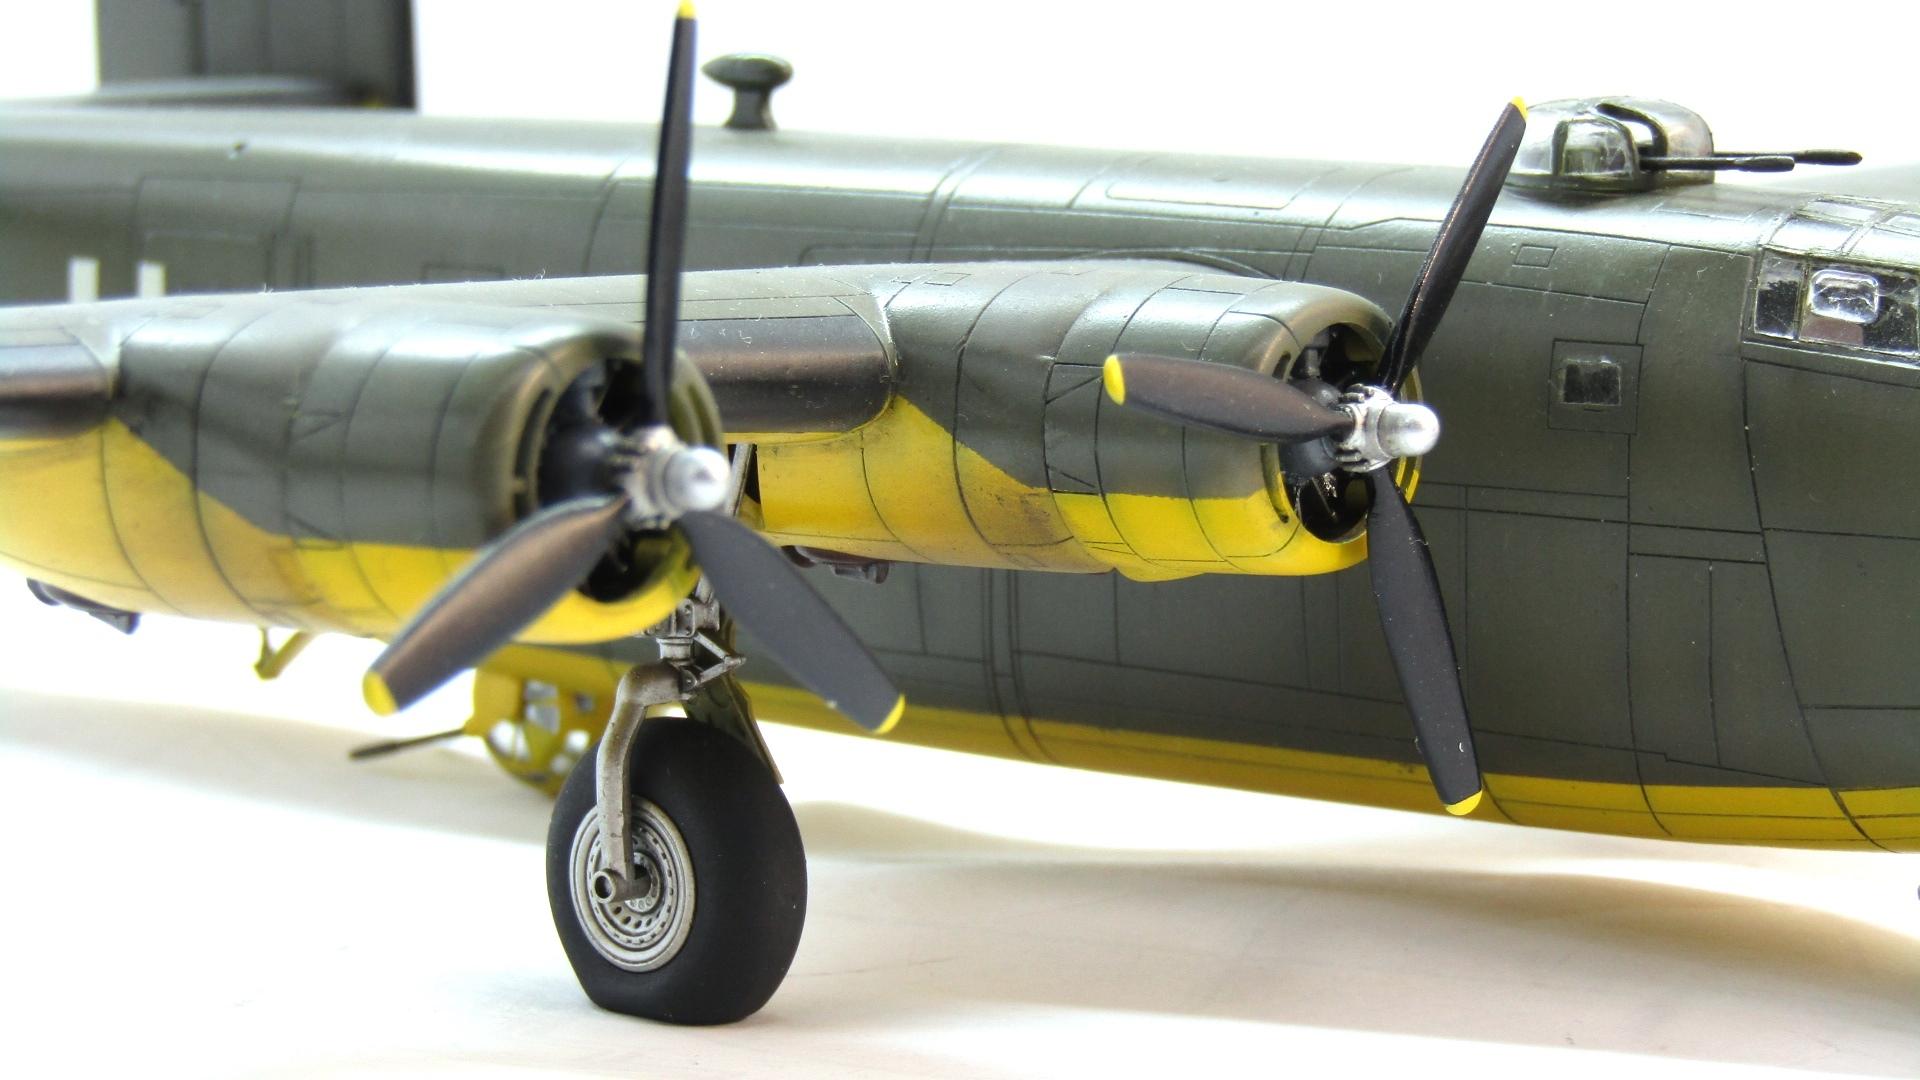 B-24H Liberator 1/72 (Academy) Xa1Cg2wiw-E